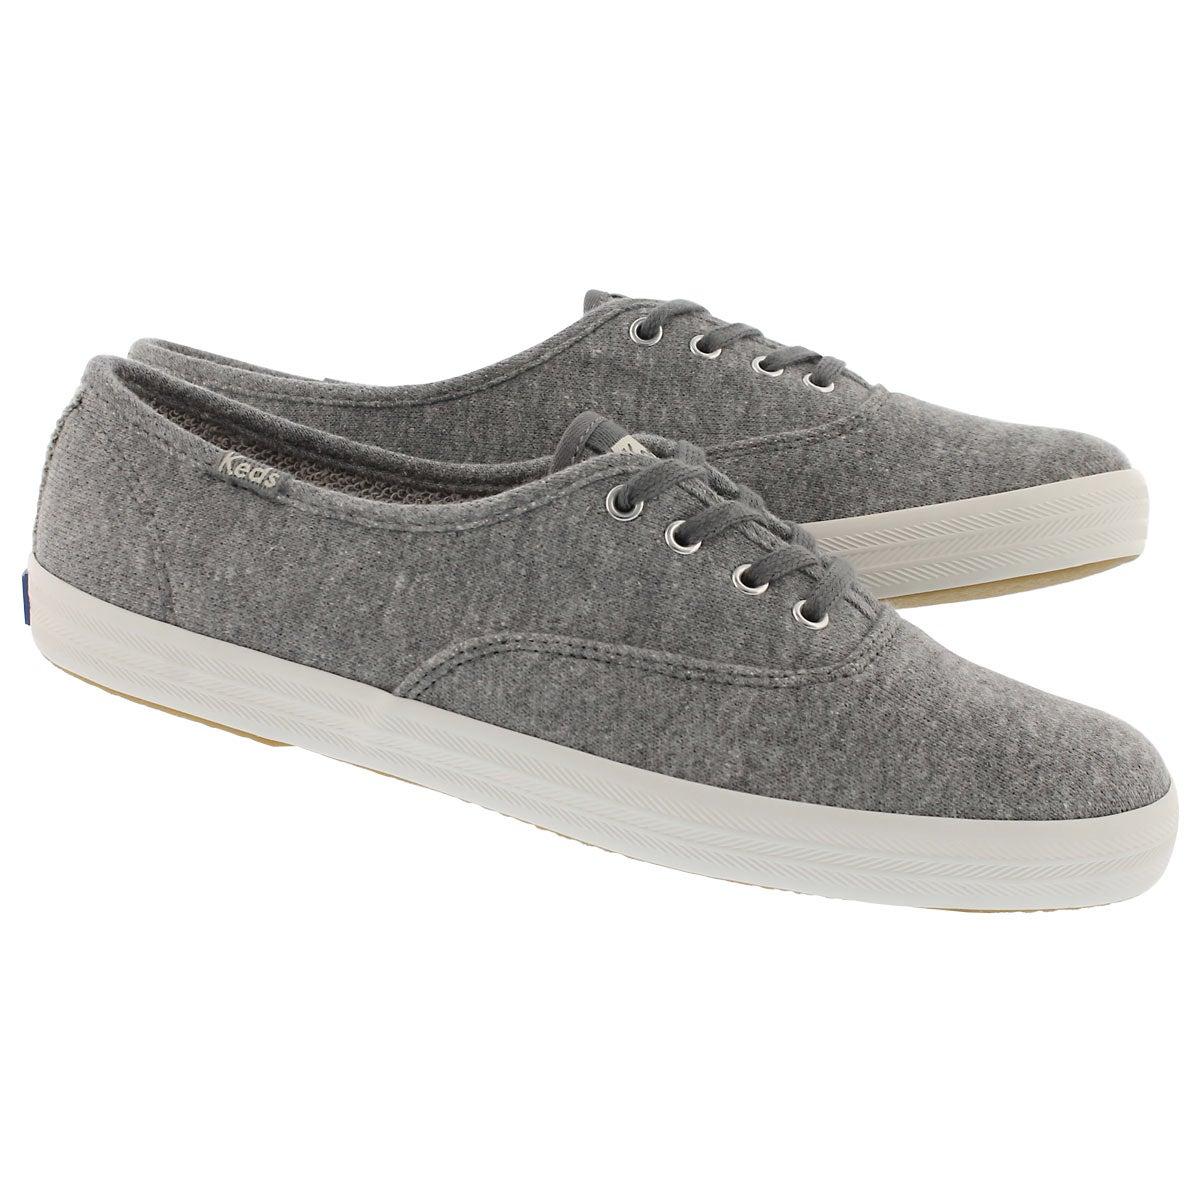 Lds Champion Sweater Jersey grey sneaker